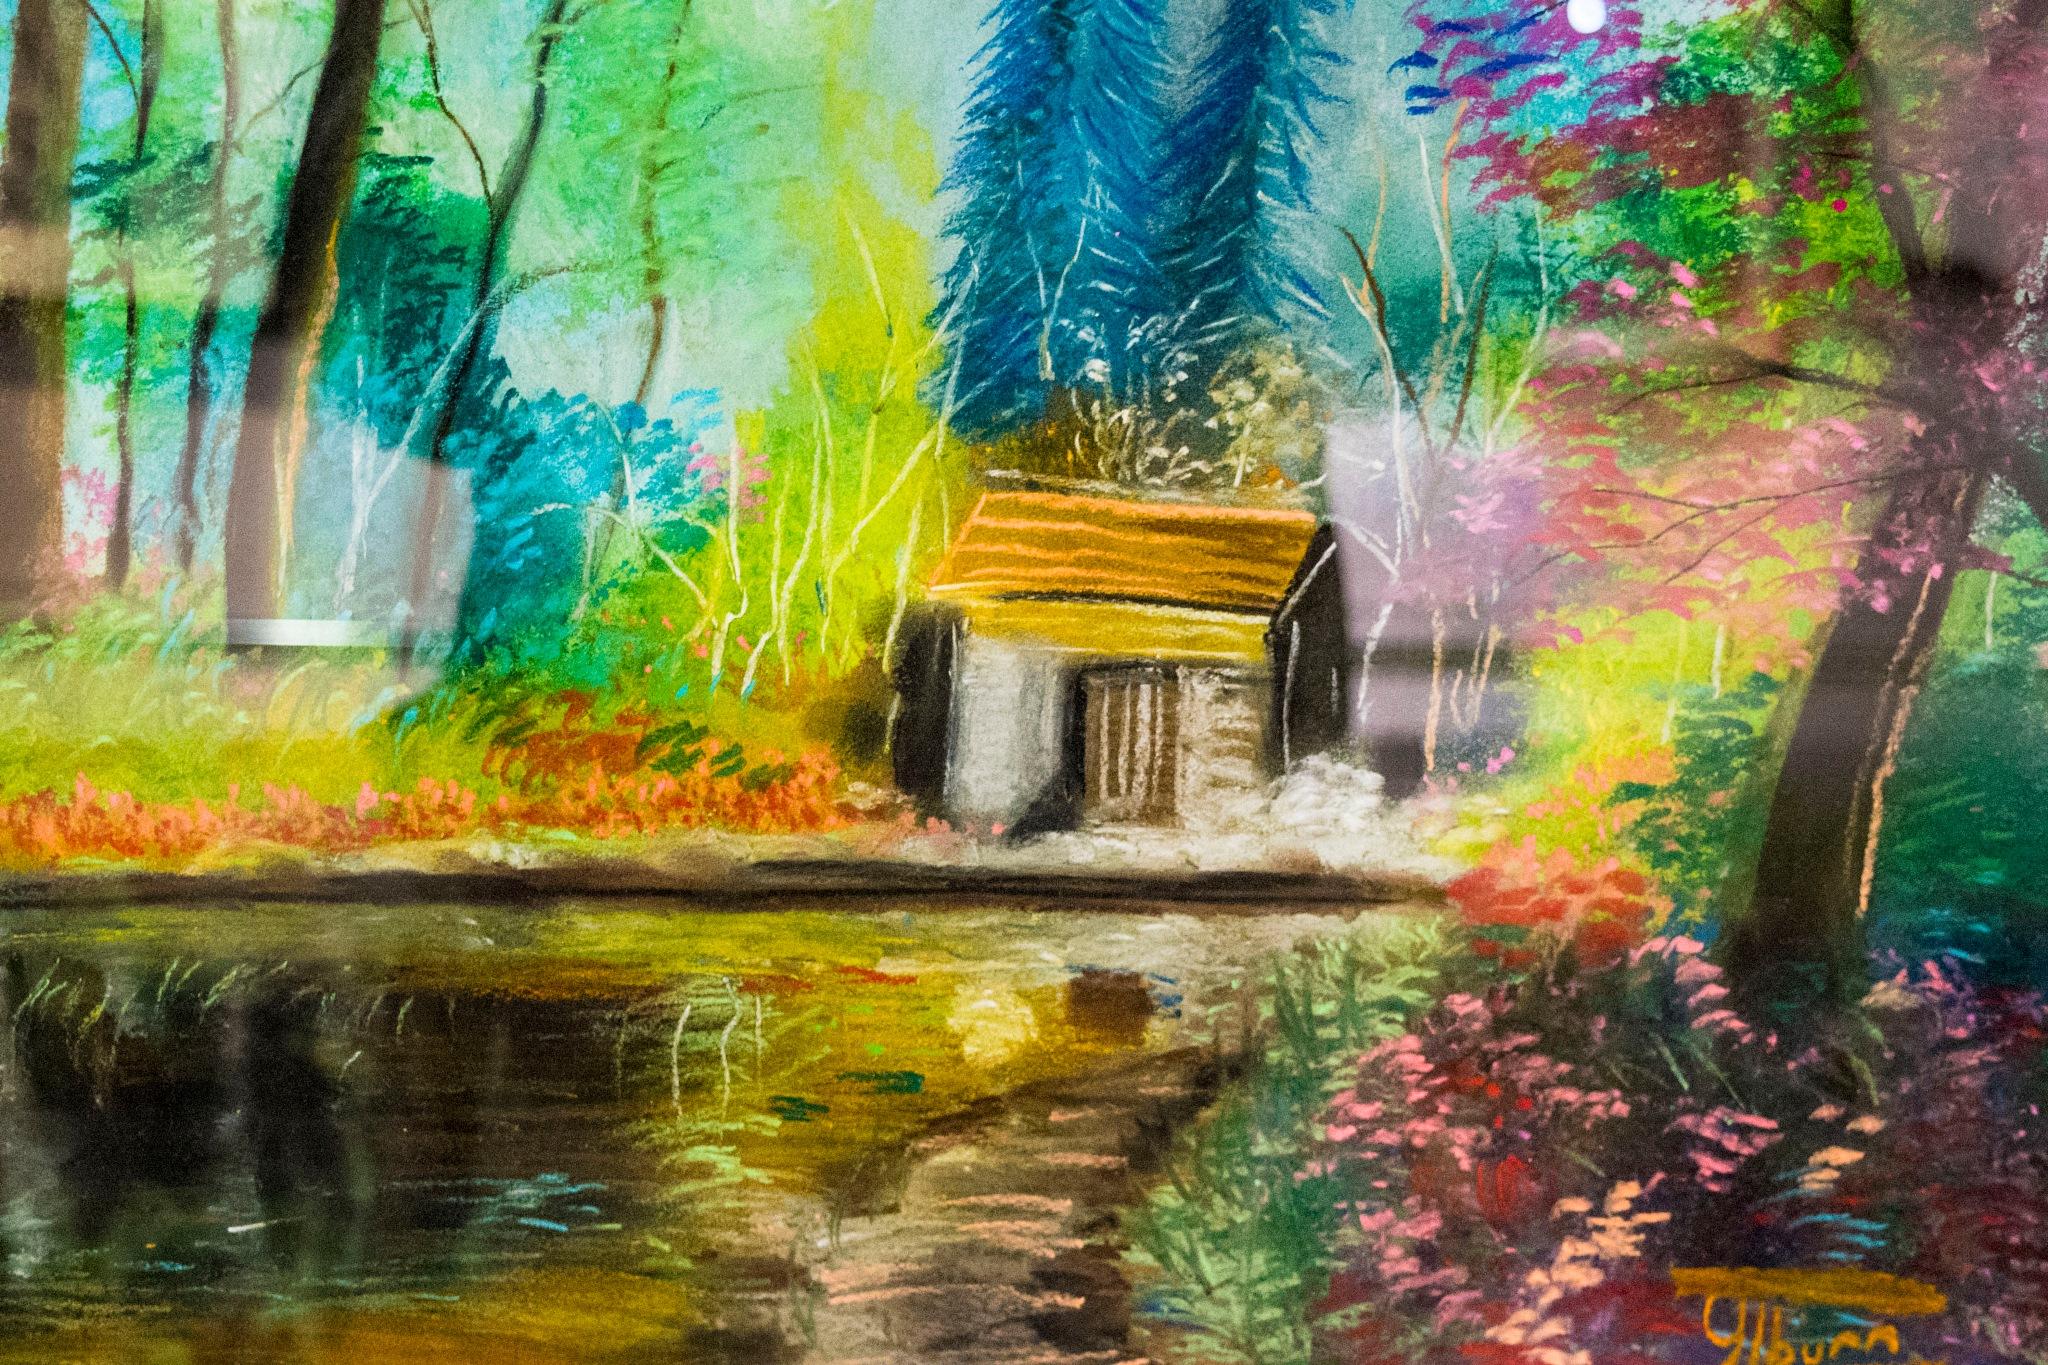 river shack by BearMan